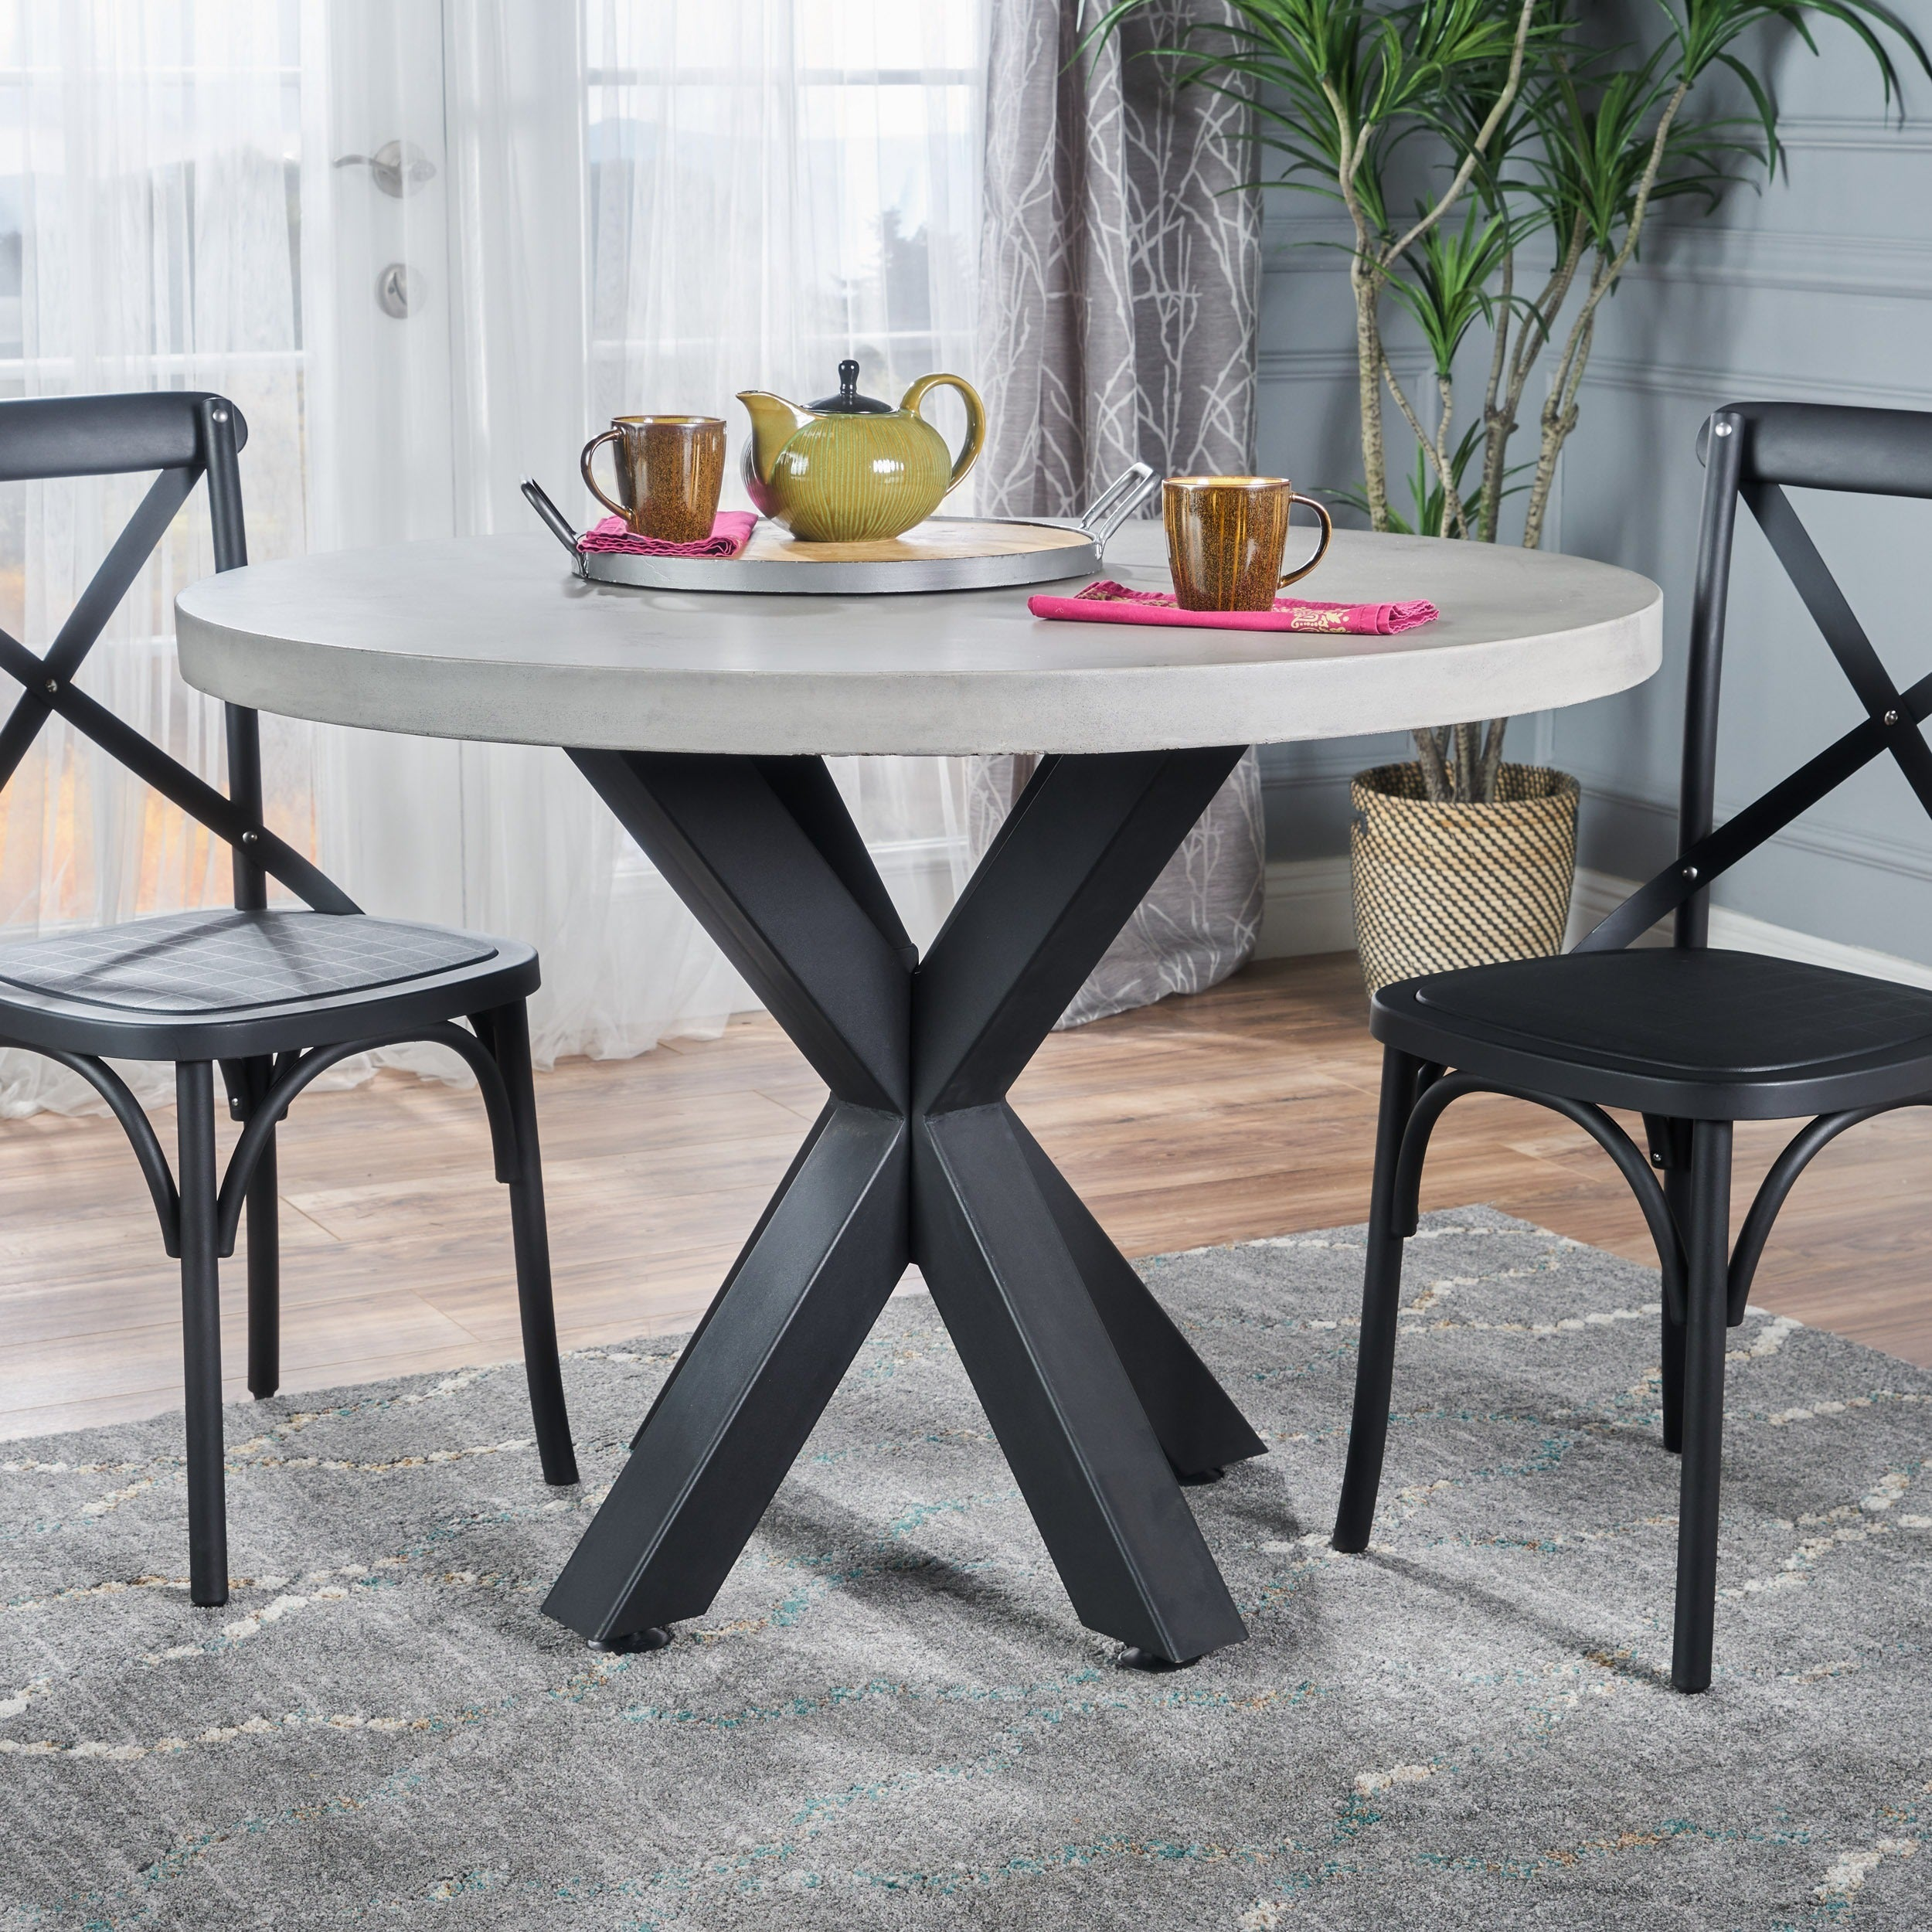 Concrete Dining Room & Bar Furniture | Find Great Furniture ...